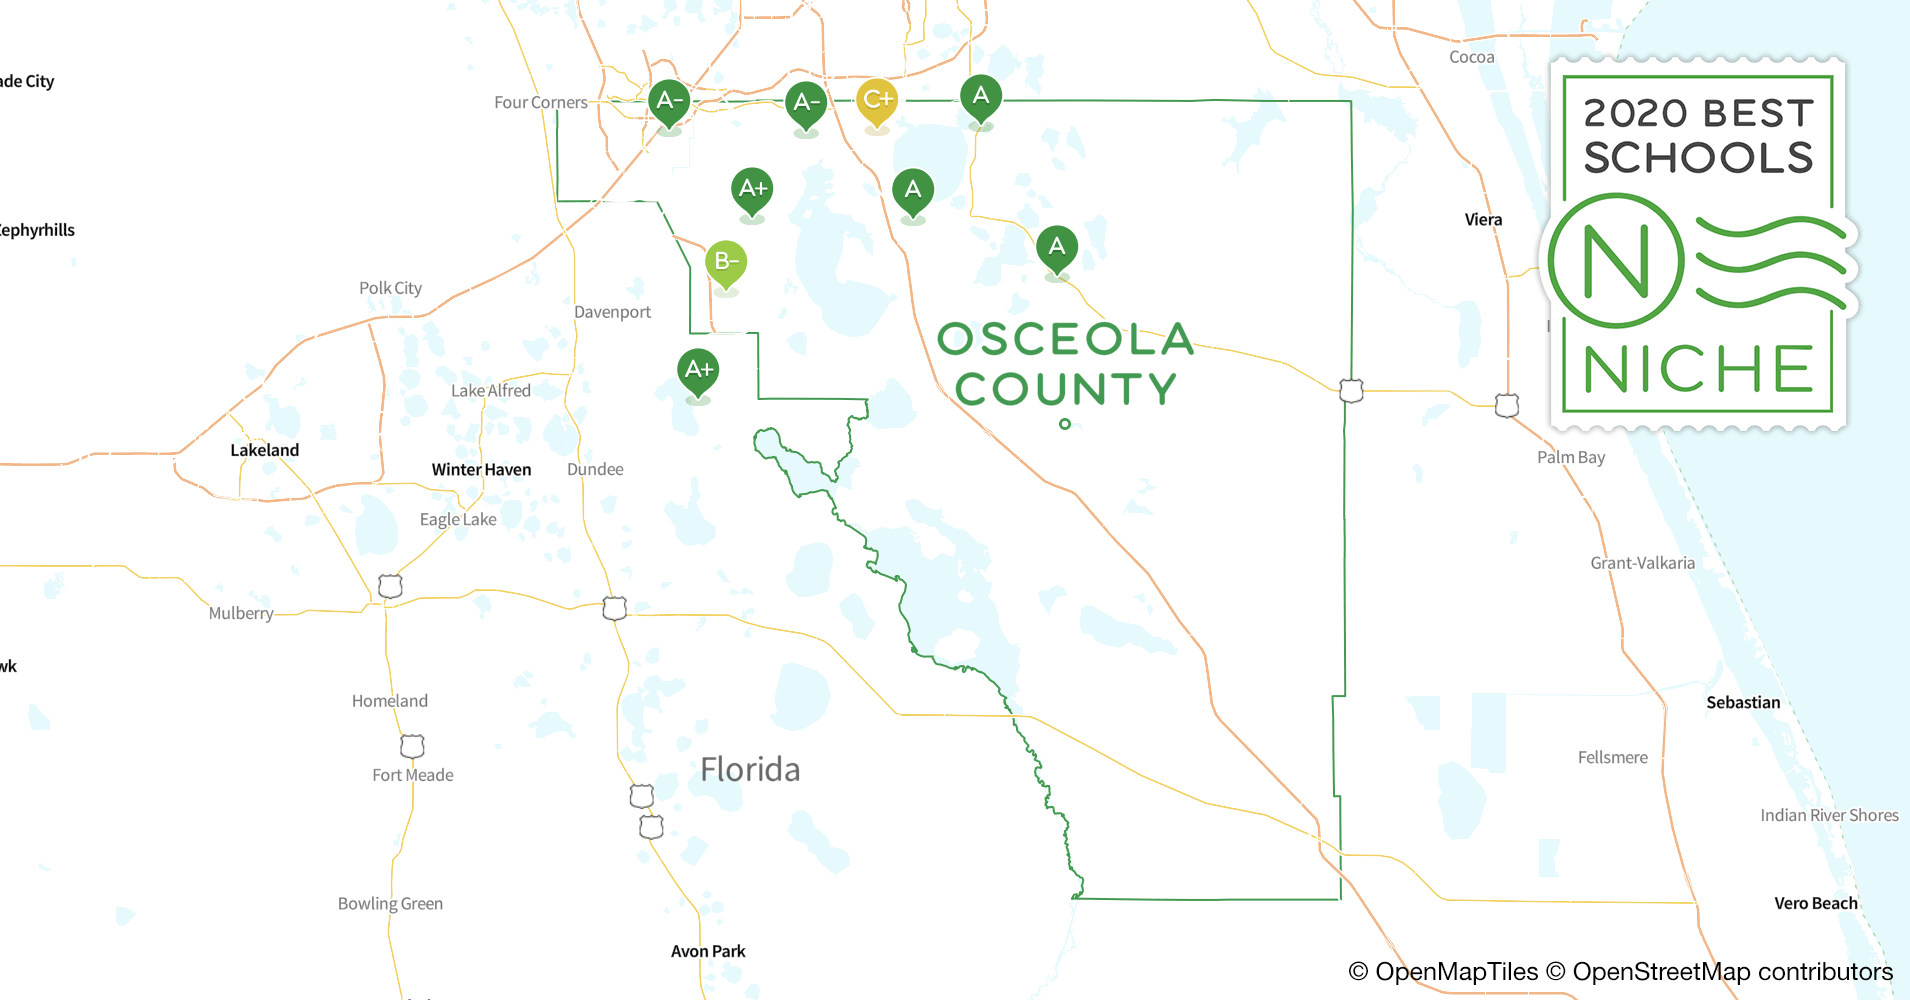 2020 Best Public Elementary Schools in Osceola County, FL ...